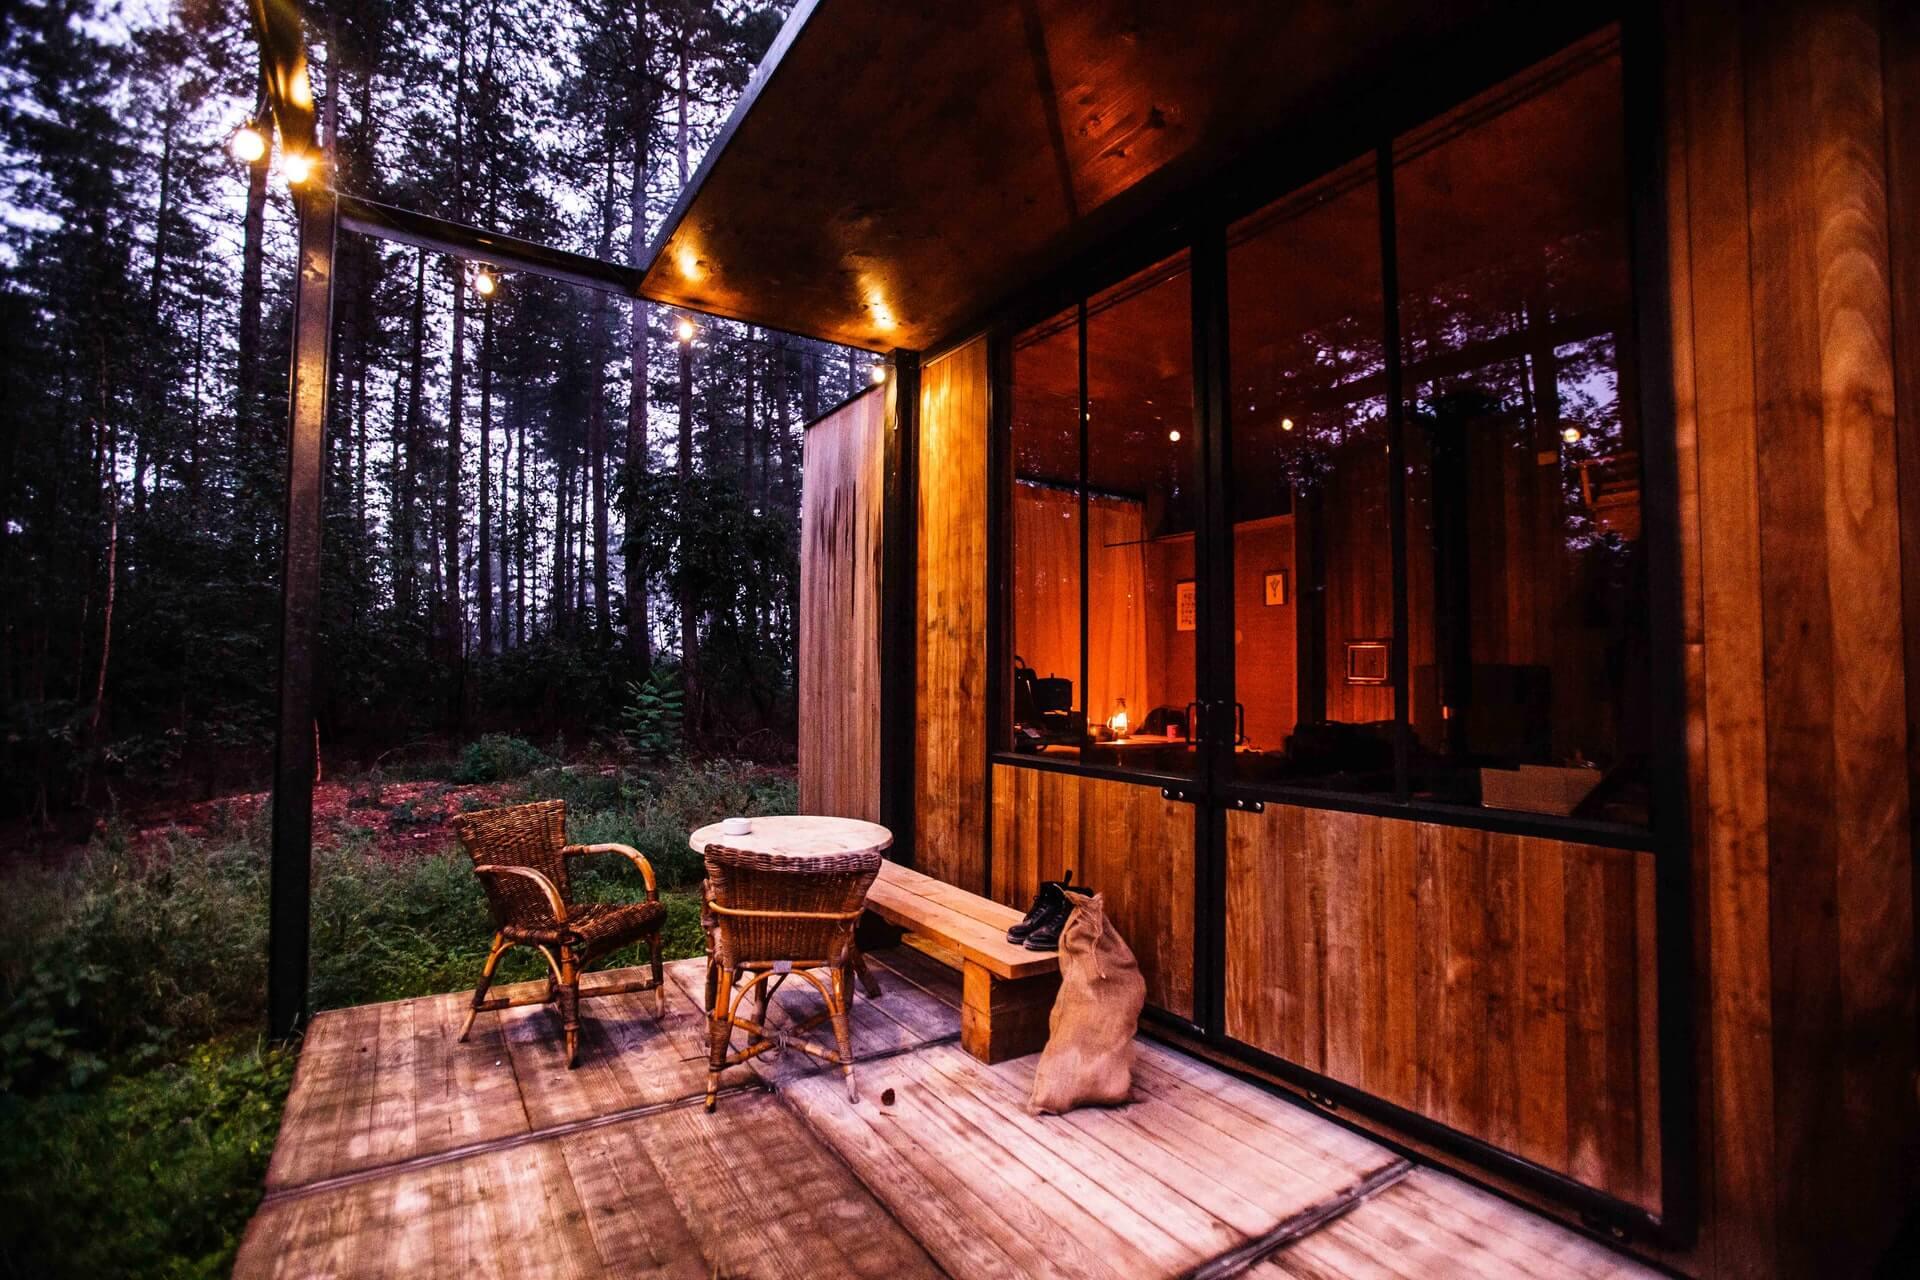 Romantic Getaways Cabins in Wears Valley, TN